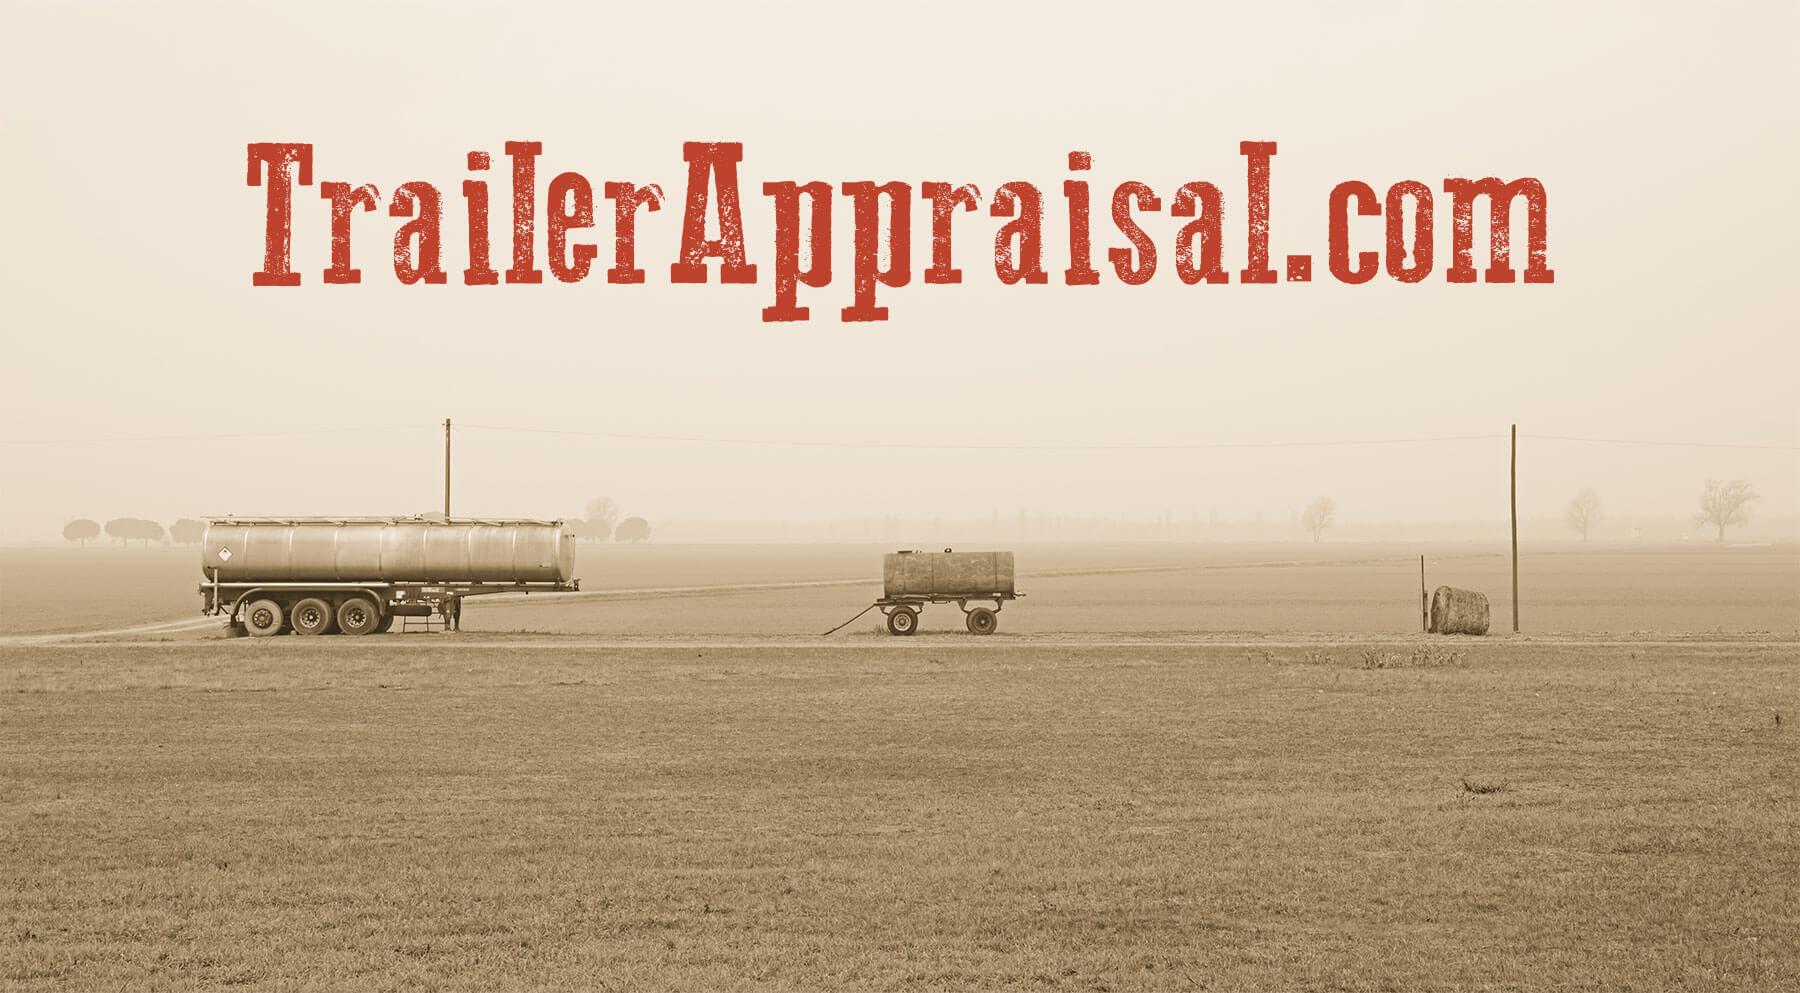 Trailer Appraisal